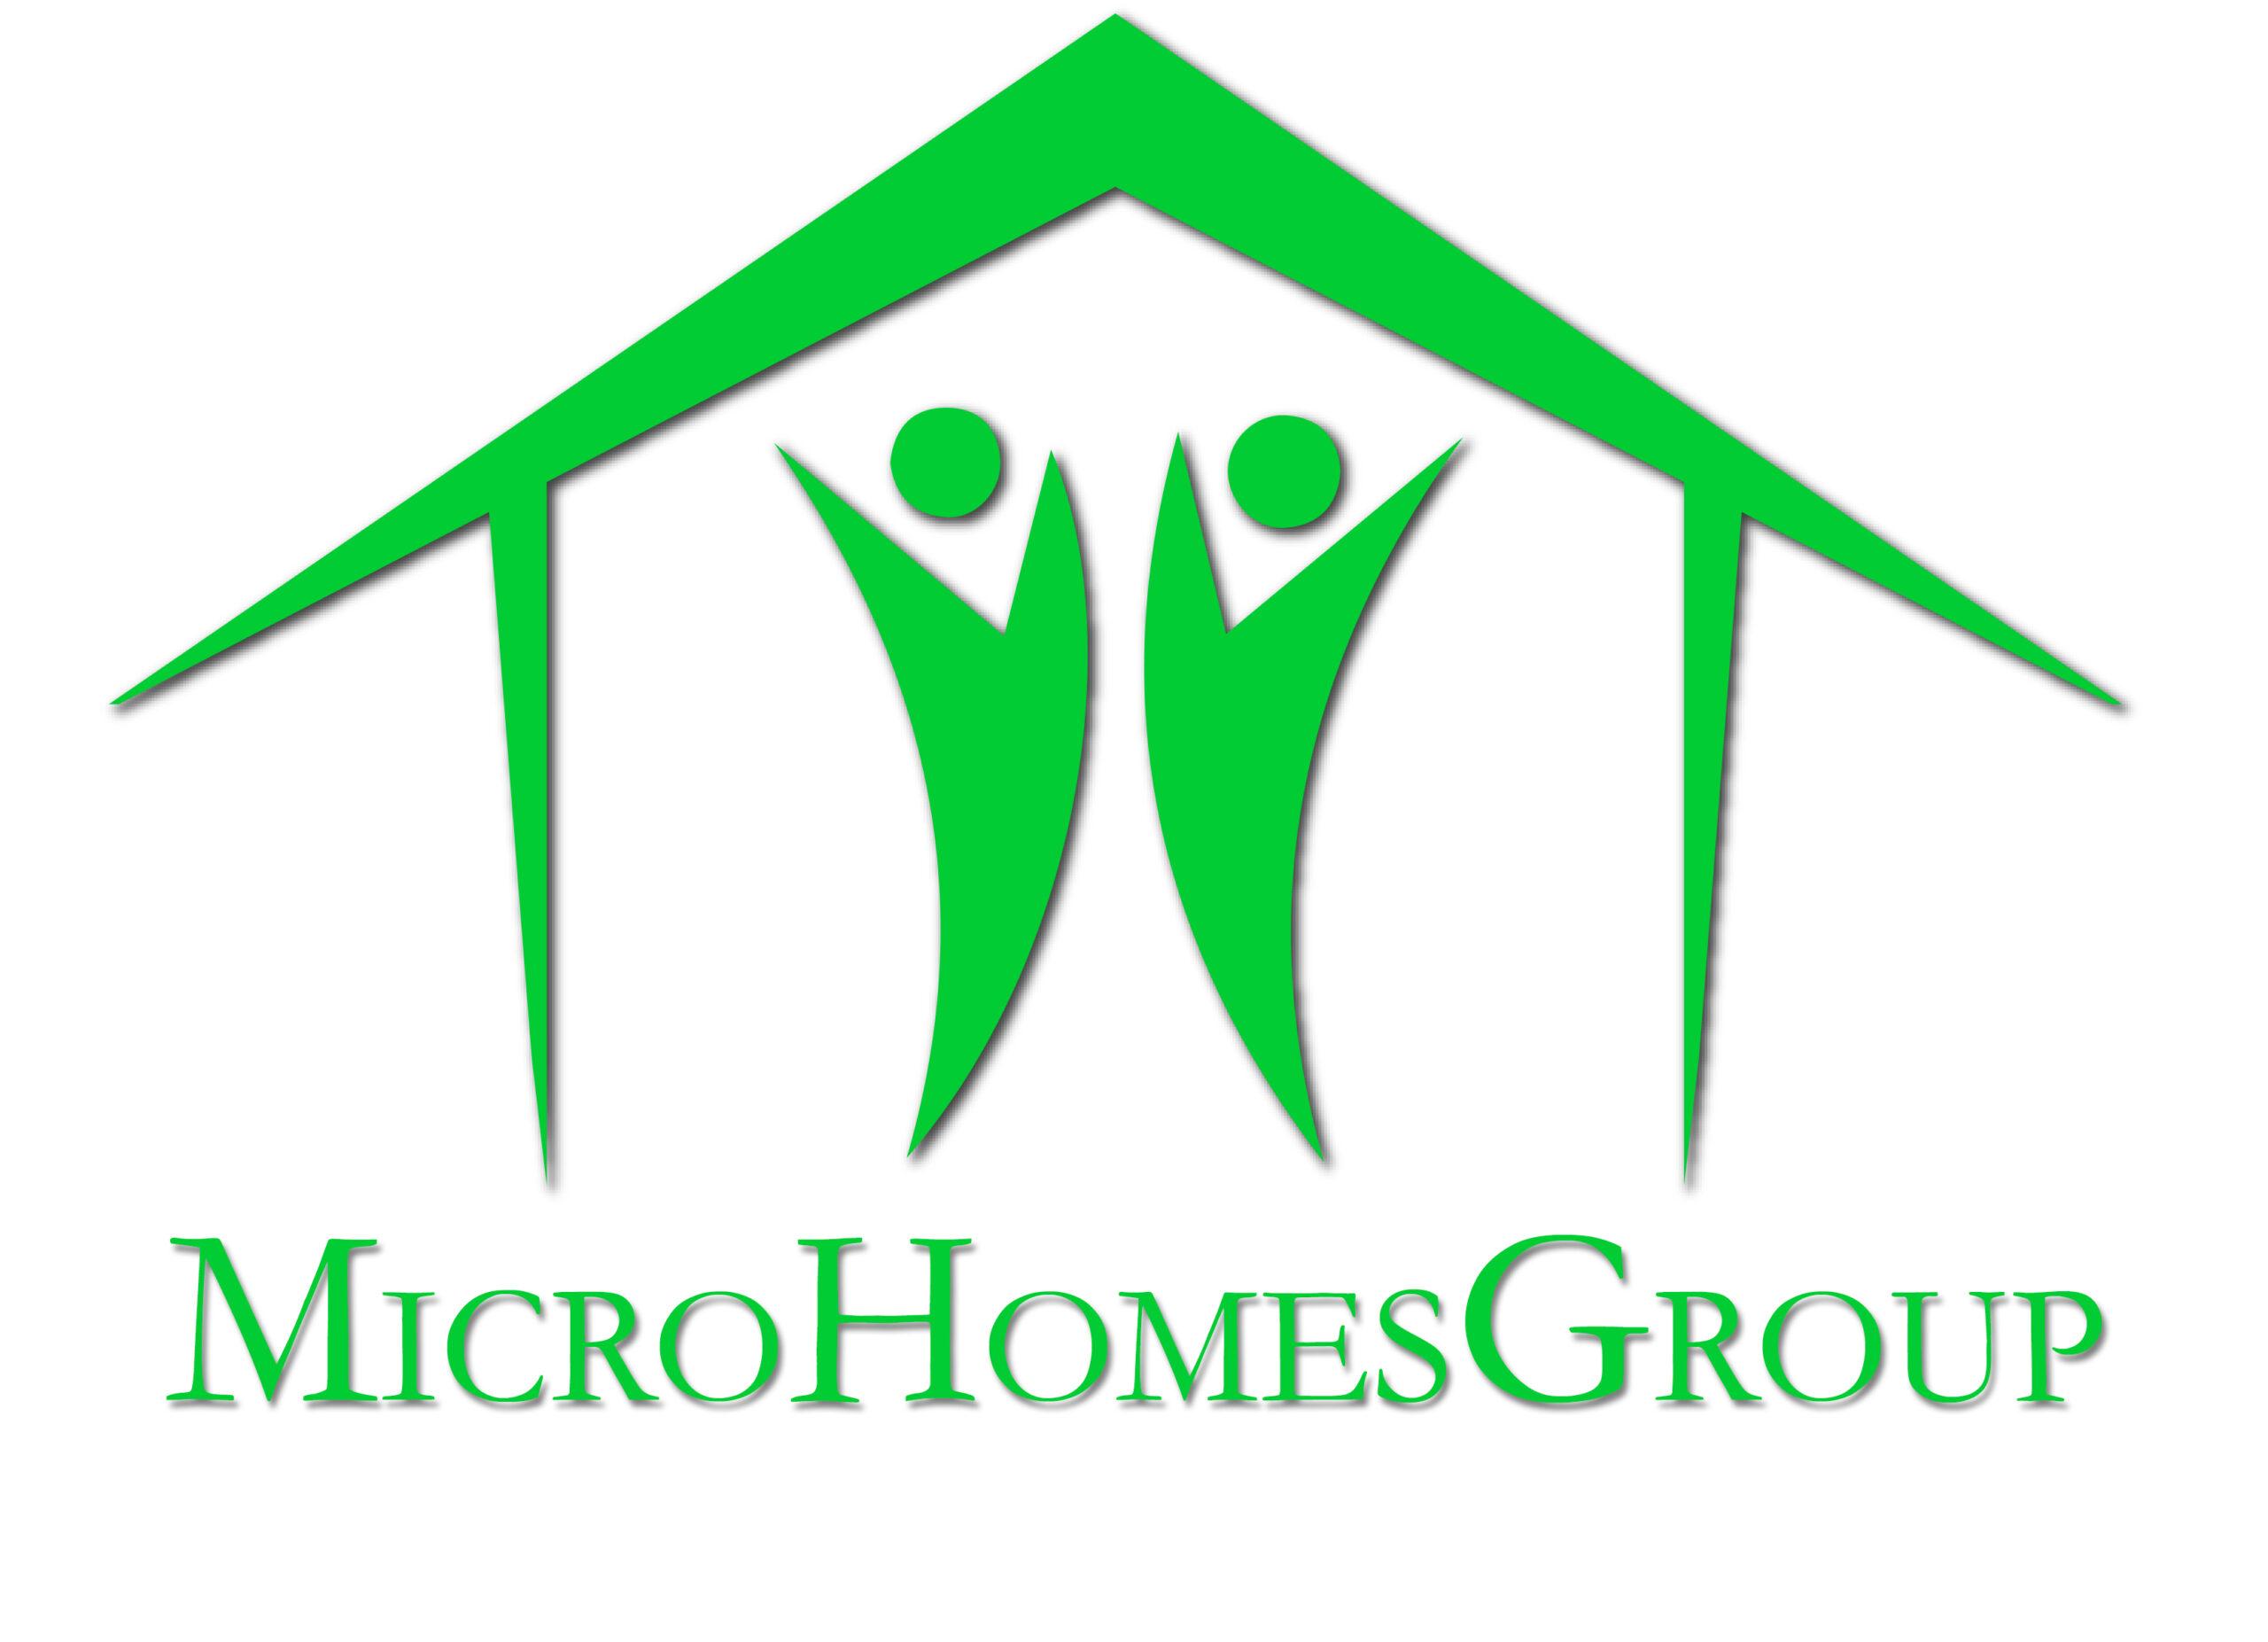 MicroHomes Group